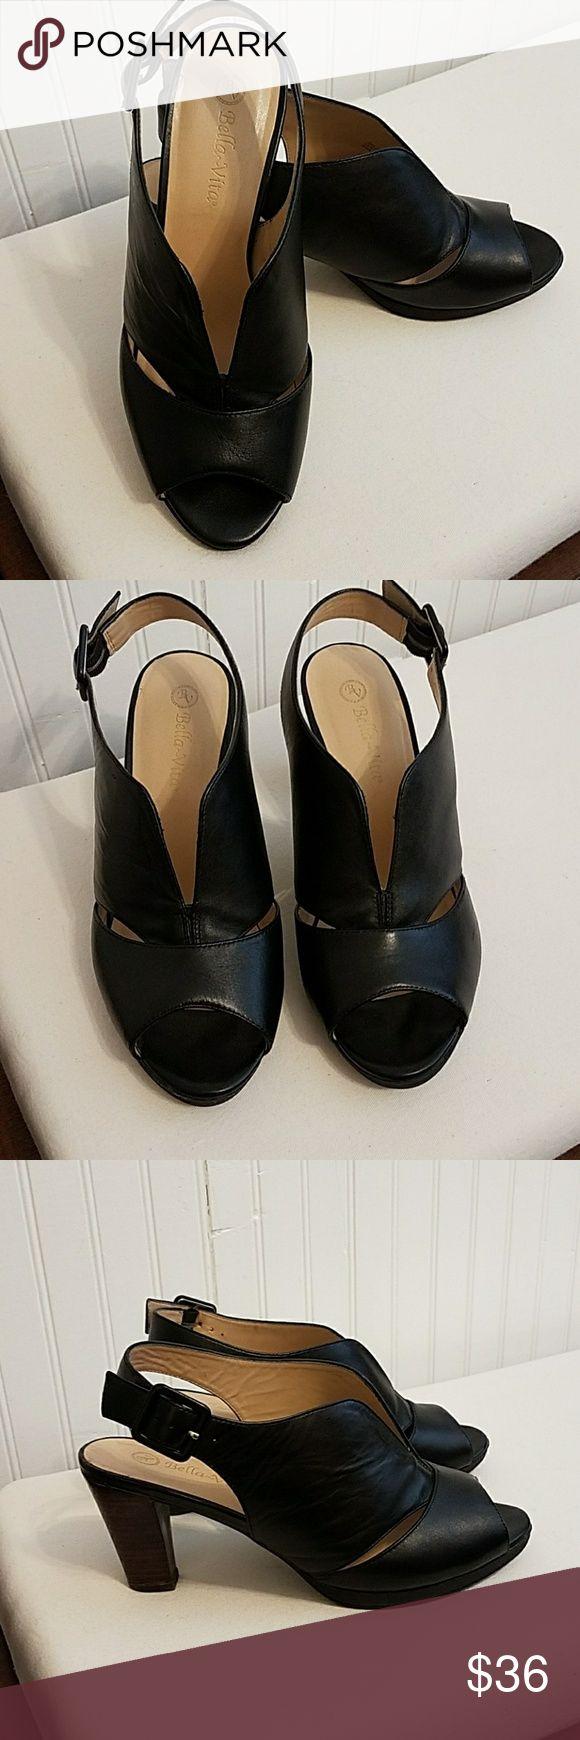 Bella Vita Leona black sandals 9w black Bella Vita Leona slingback sandals.  Leather upper with 3-inch stacked heel. Gently worn in great condition! Bella Vita Shoes Sandals